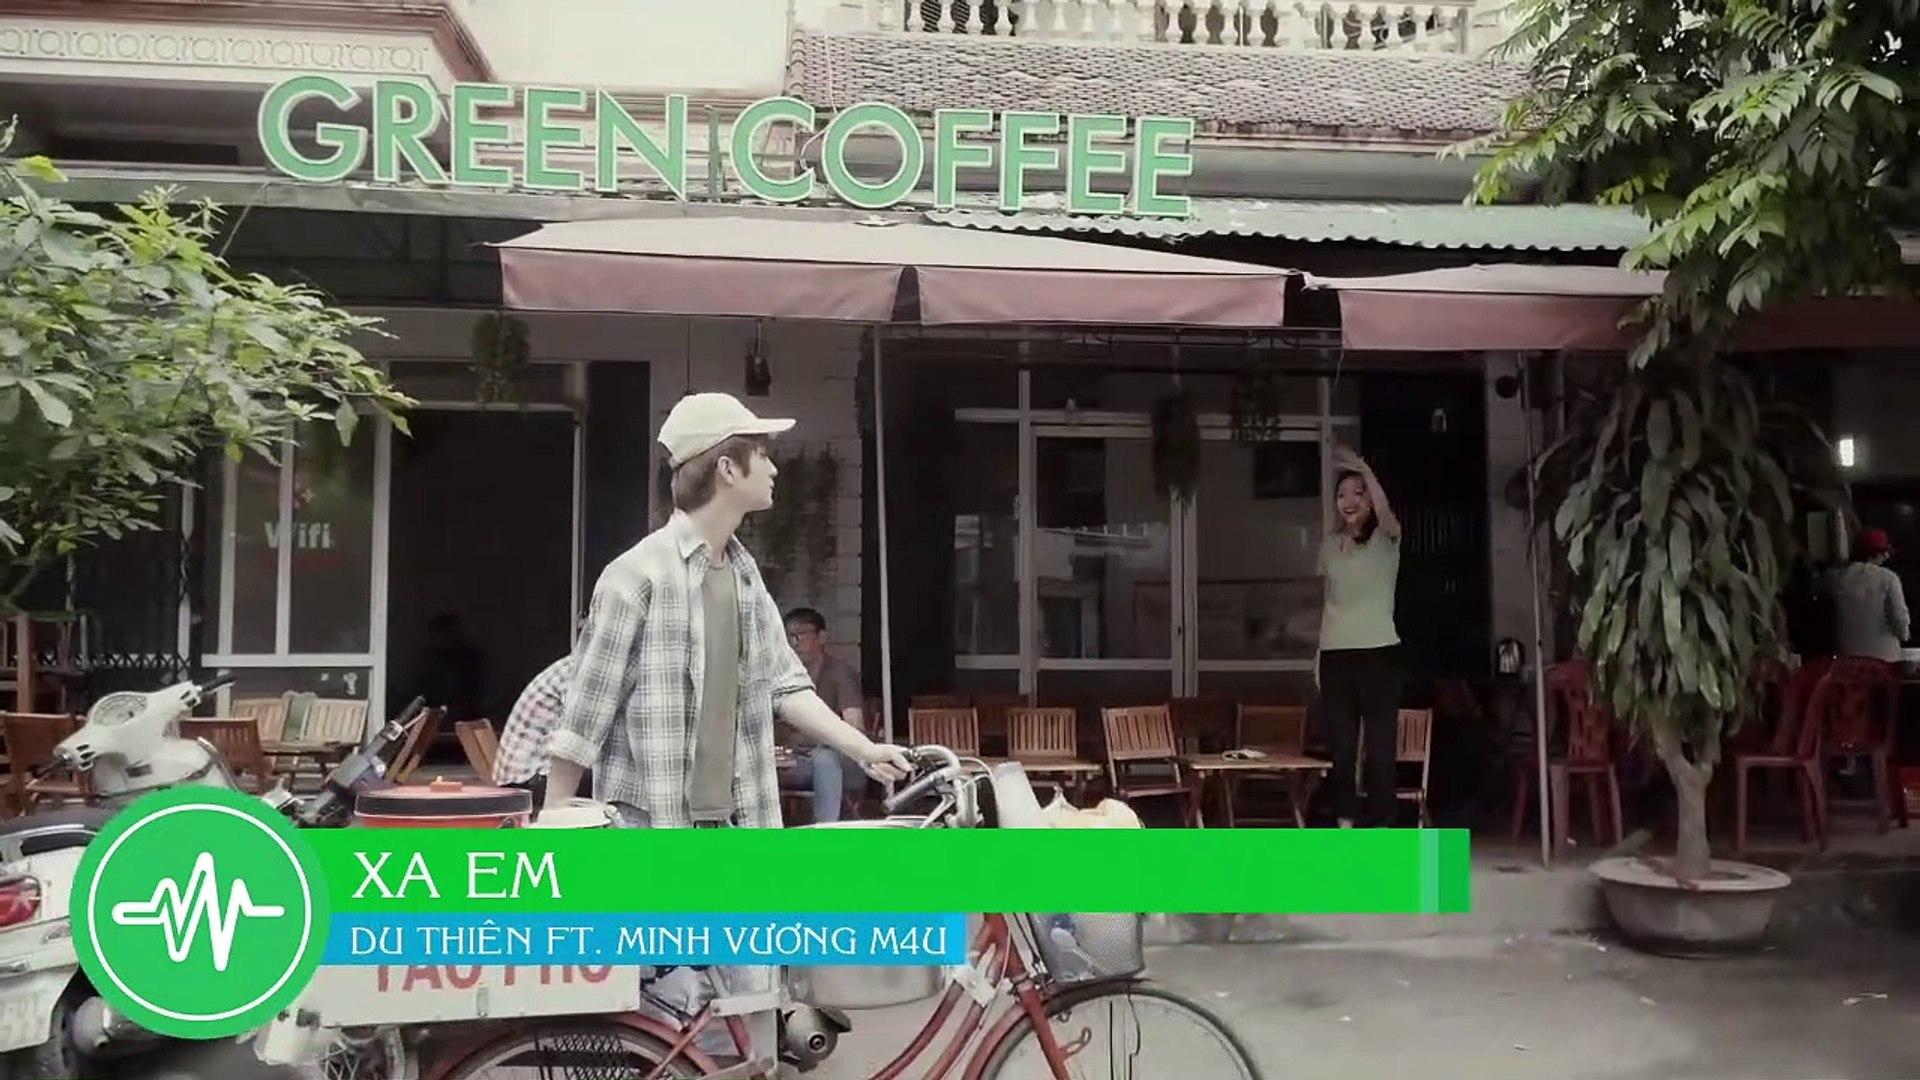 [Karaoke] Xa Em - Du Thiên Ft. Minh Vương M4U [Beat]